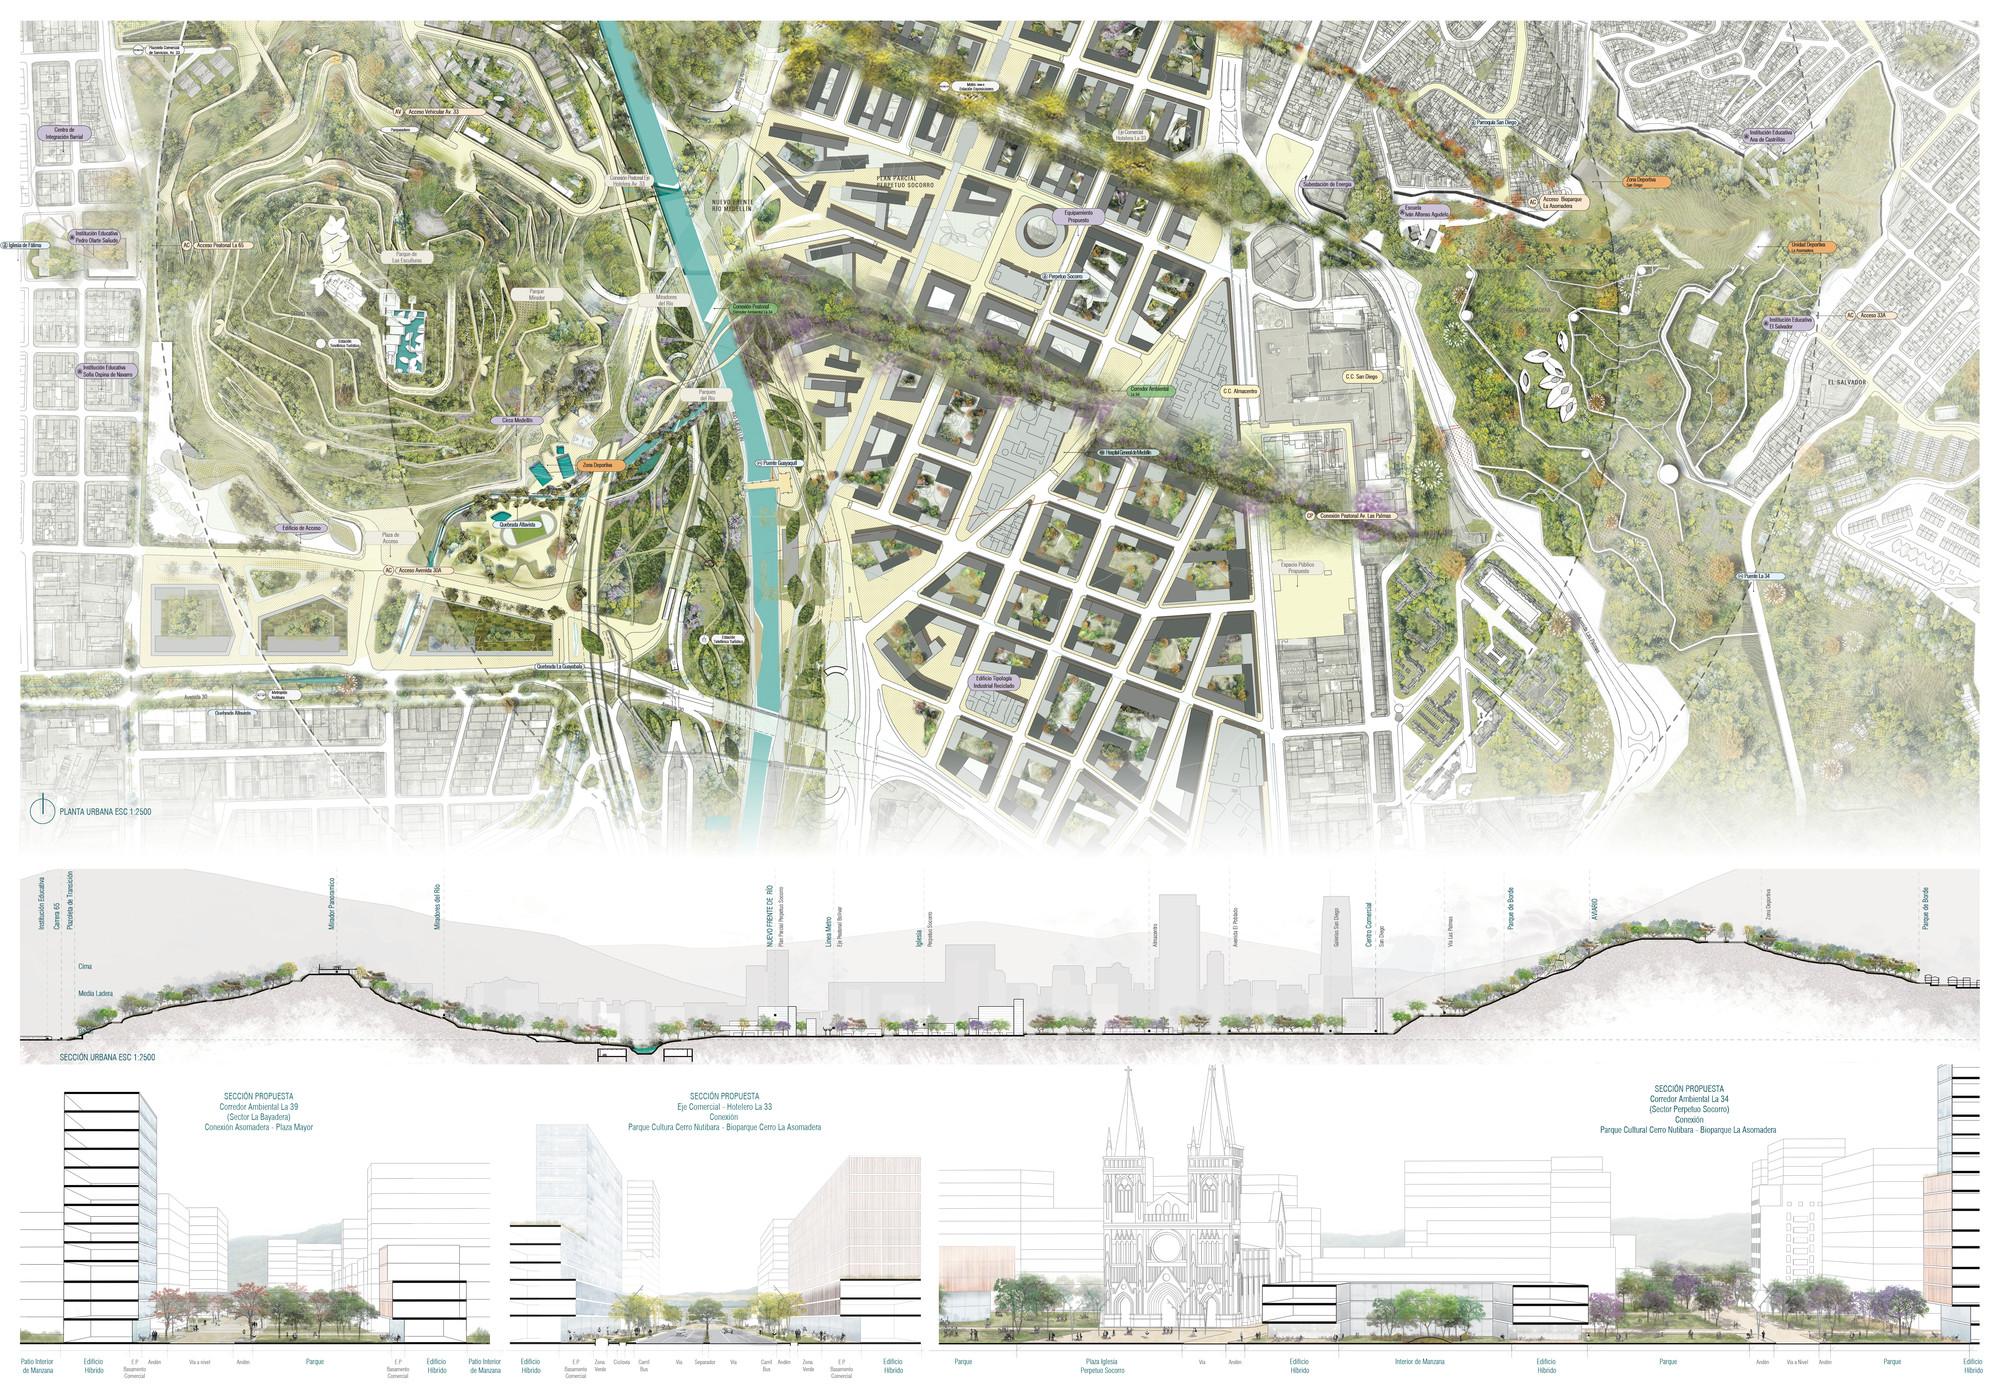 Galer a de c lula arquitectura segundo y tercer lugar por for Plan de arquitectura